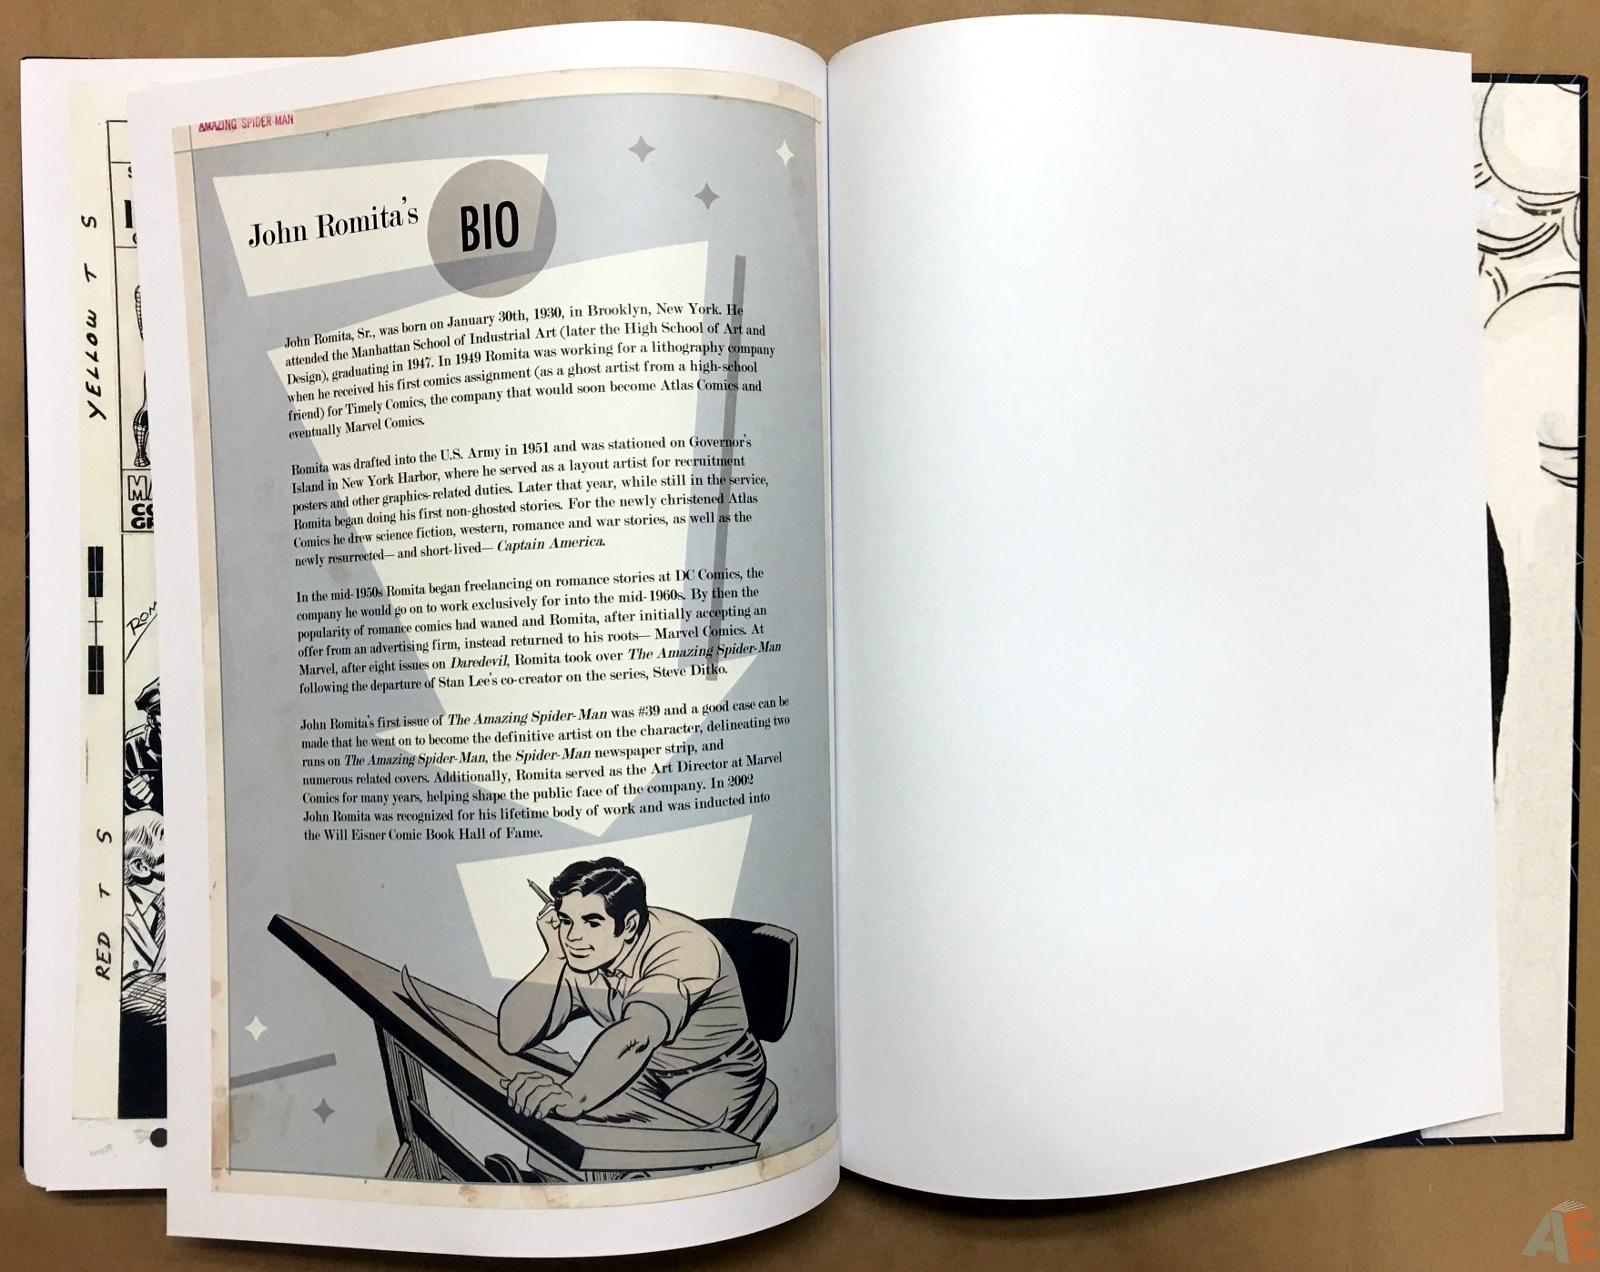 John Romita's The Amazing Spider-Man Artist's Edition 58